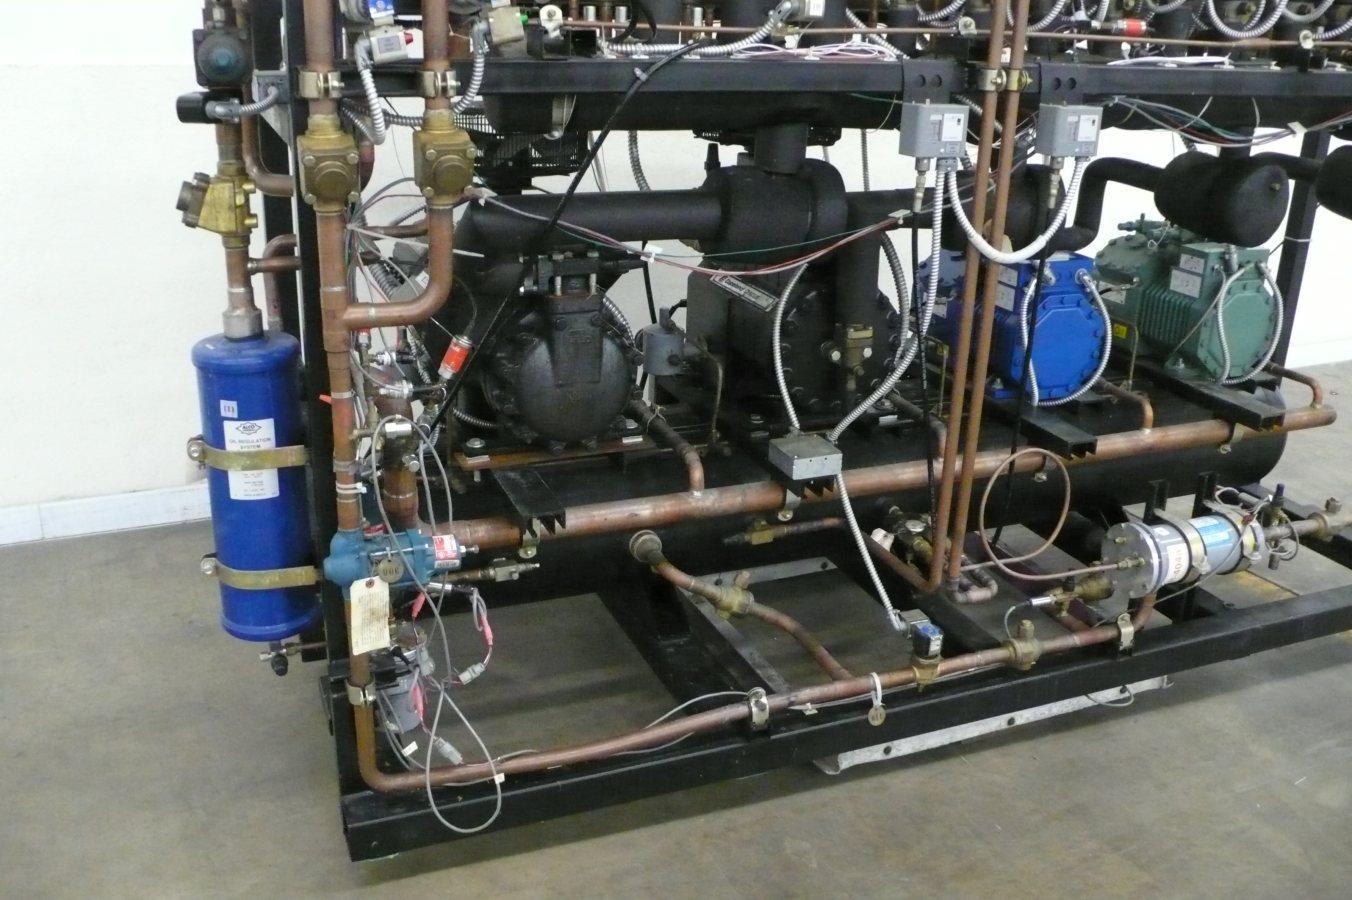 copeland discus wiring diagram mile marker hydraulic winch hussmann 30 hp low temp freezer refrigeration rack